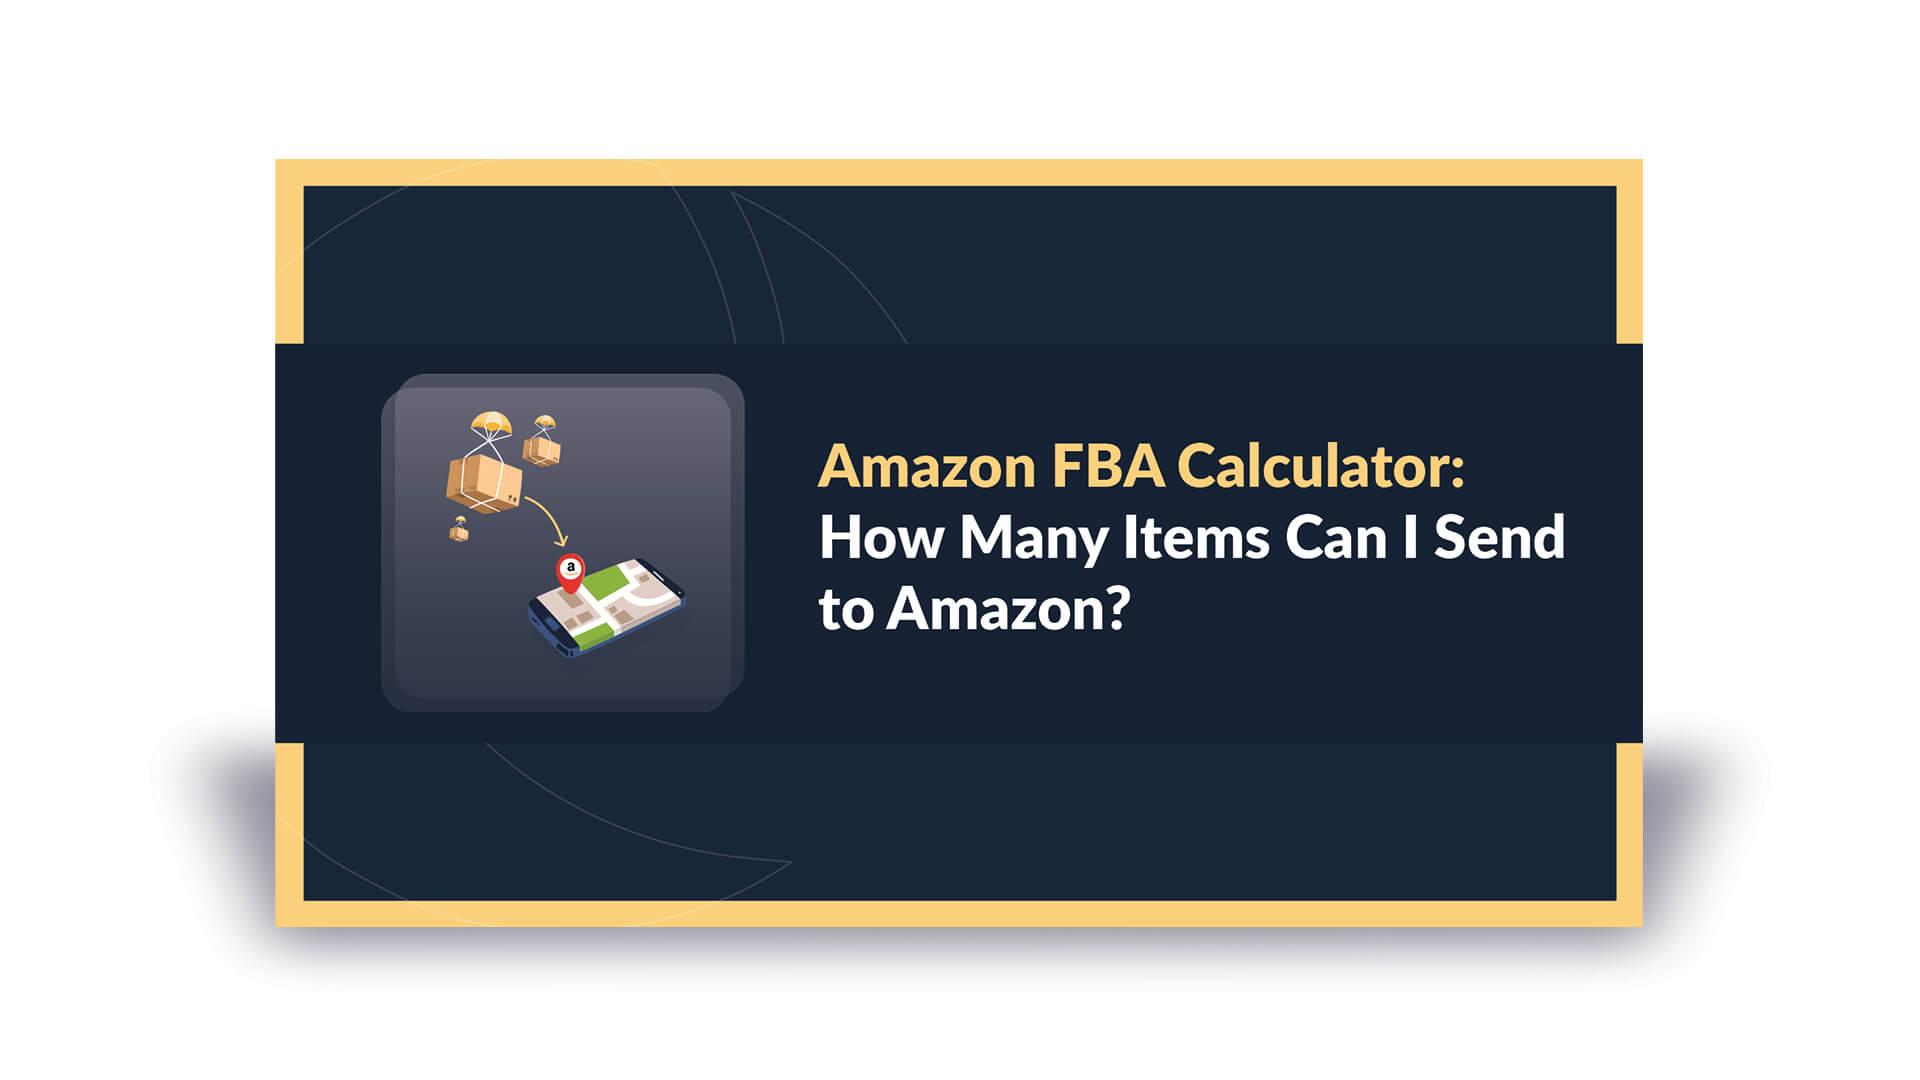 Amazon FBA Calculator: How Many Items Can I Send to Amazon?